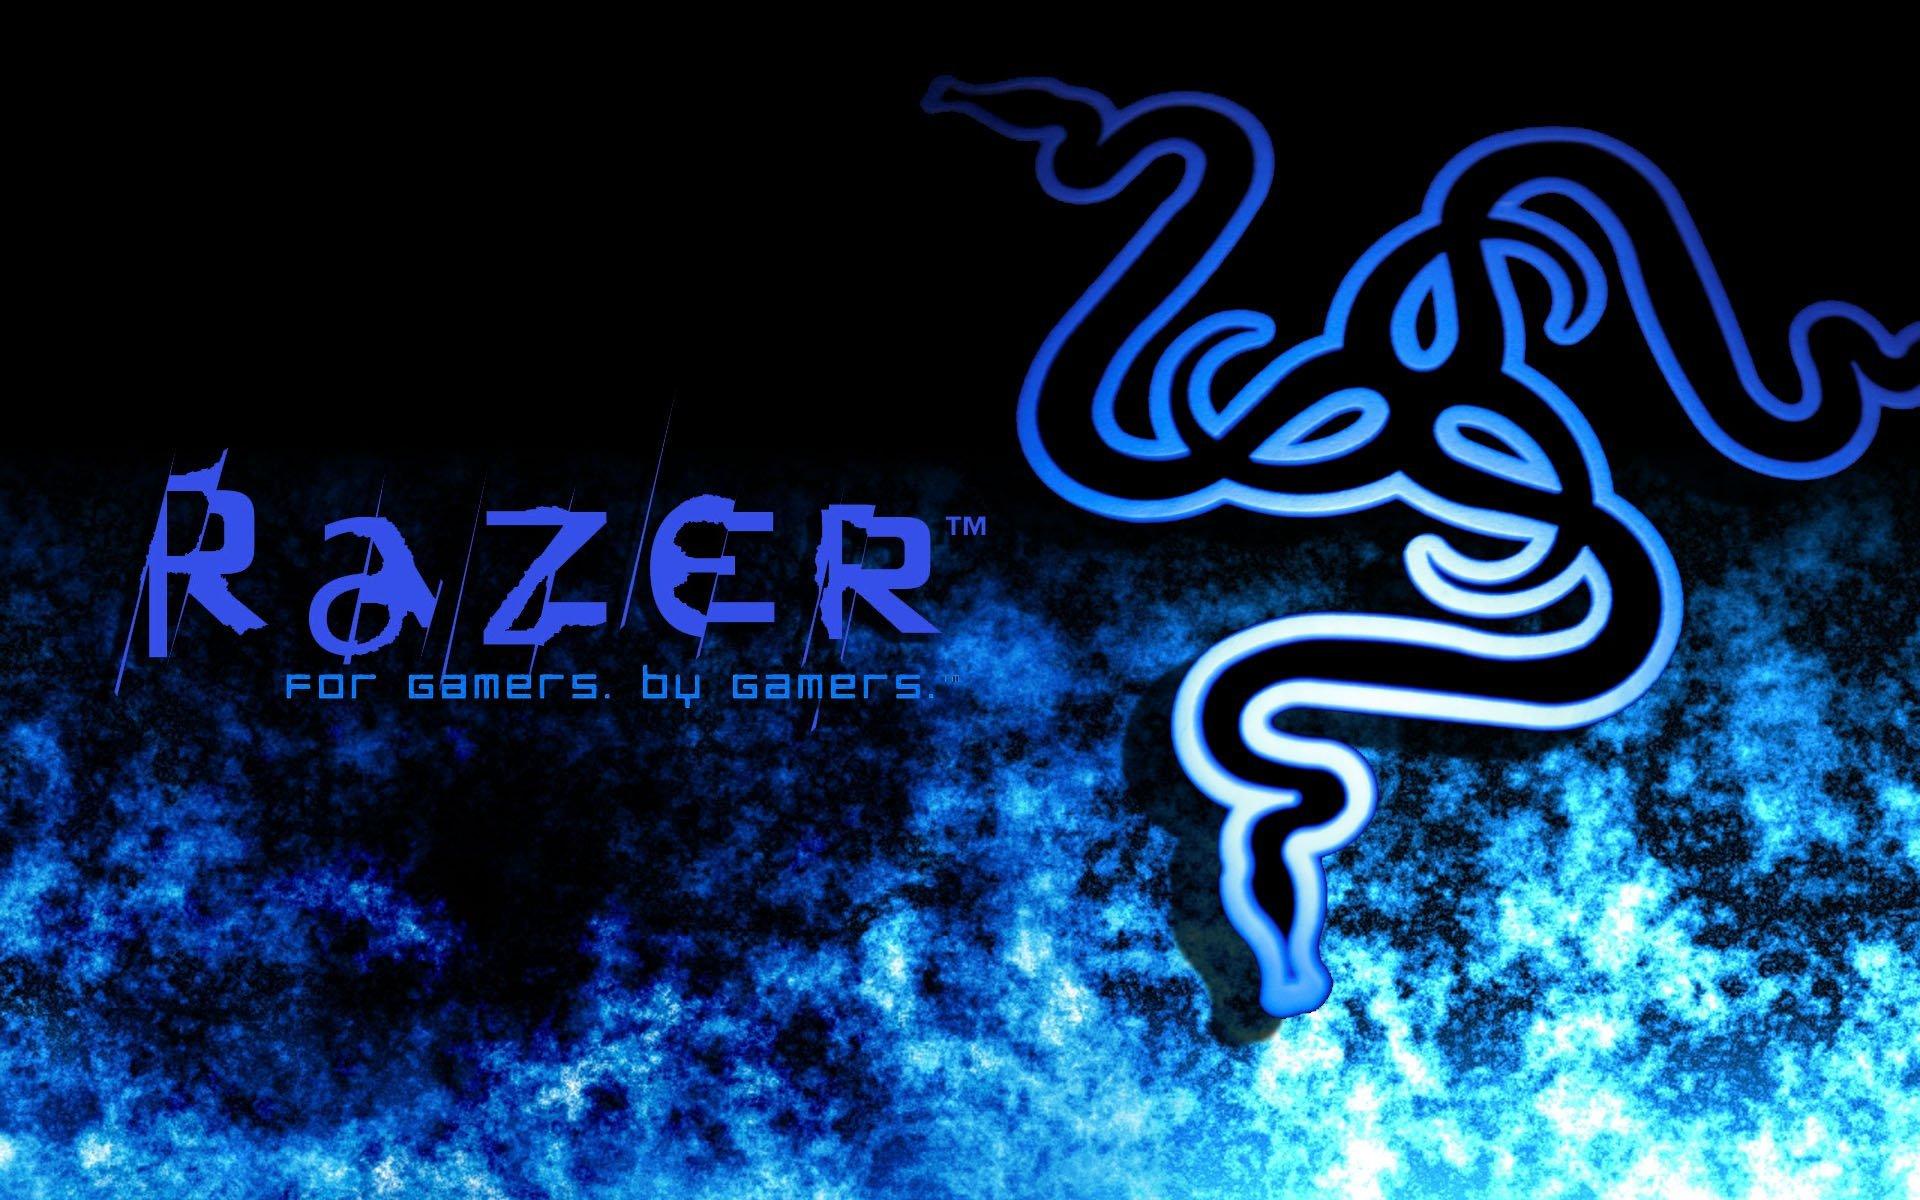 Blue gaming wallpaper wallpapersafari for Sfondi razer